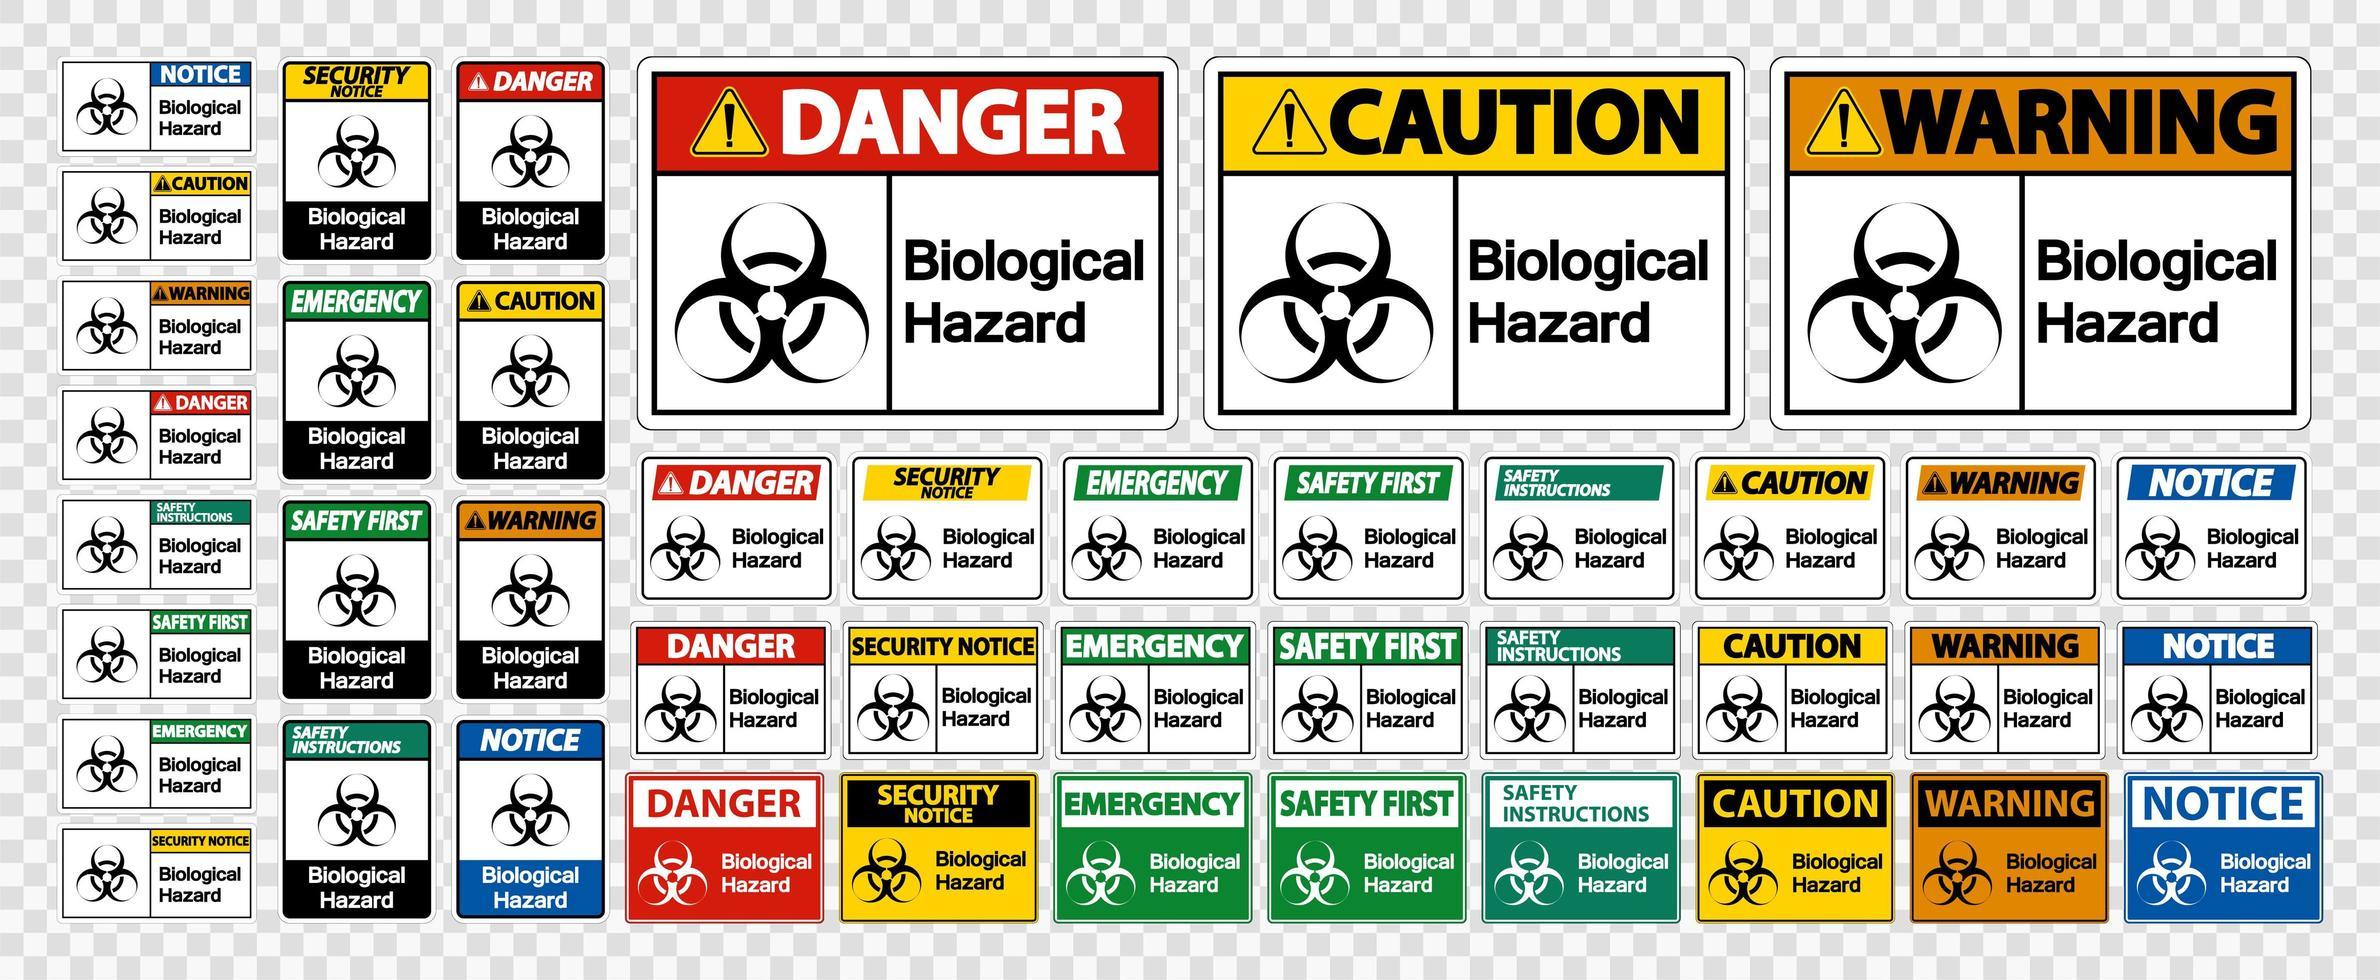 Signos de símbolo de peligro biológico sobre fondo blanco vector